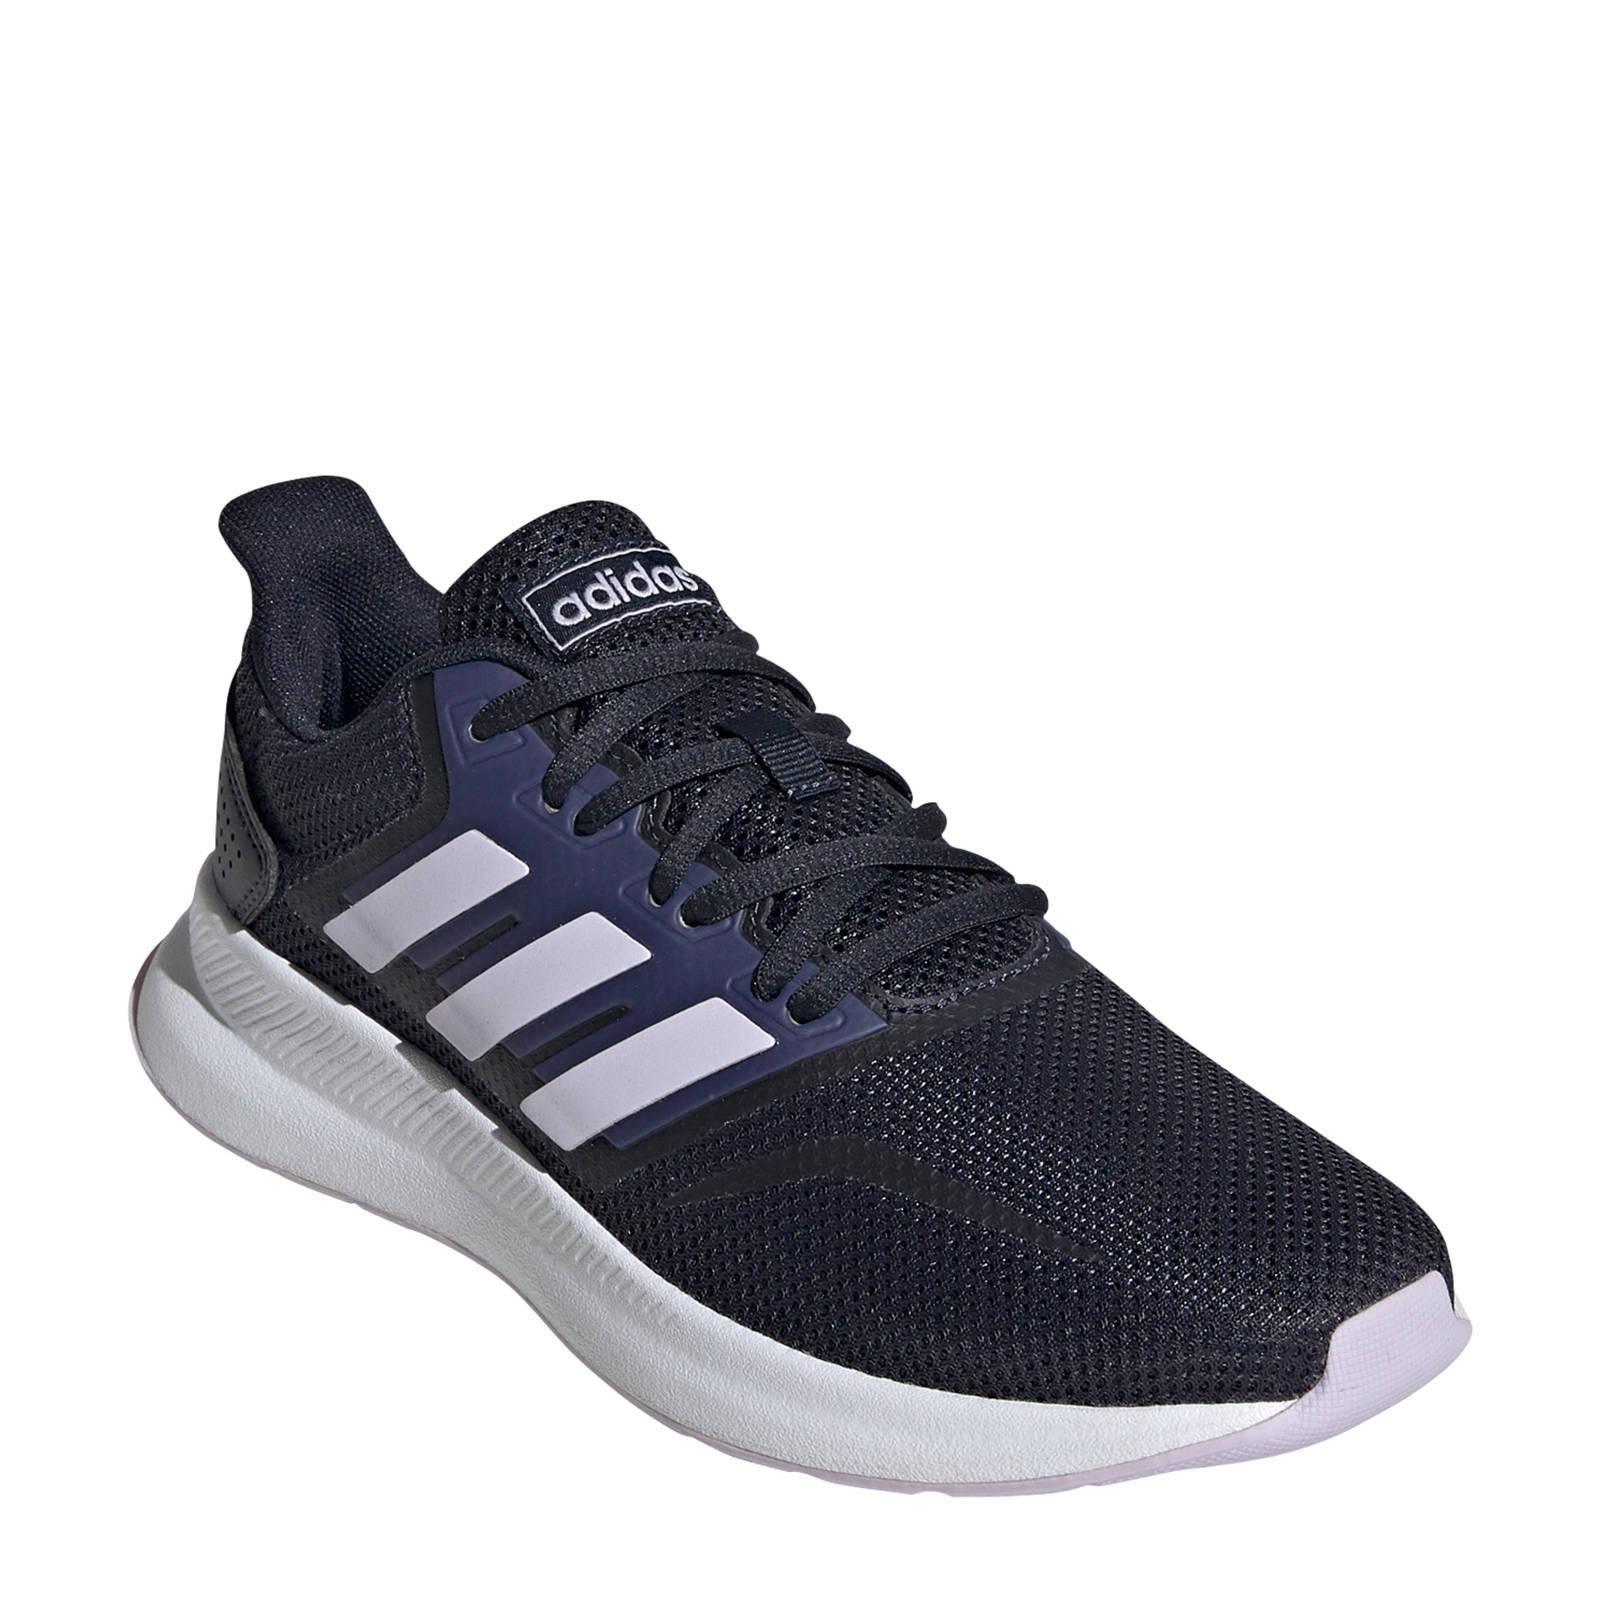 adidas Performance Runfalcon hardloopschoenen donkerblauw